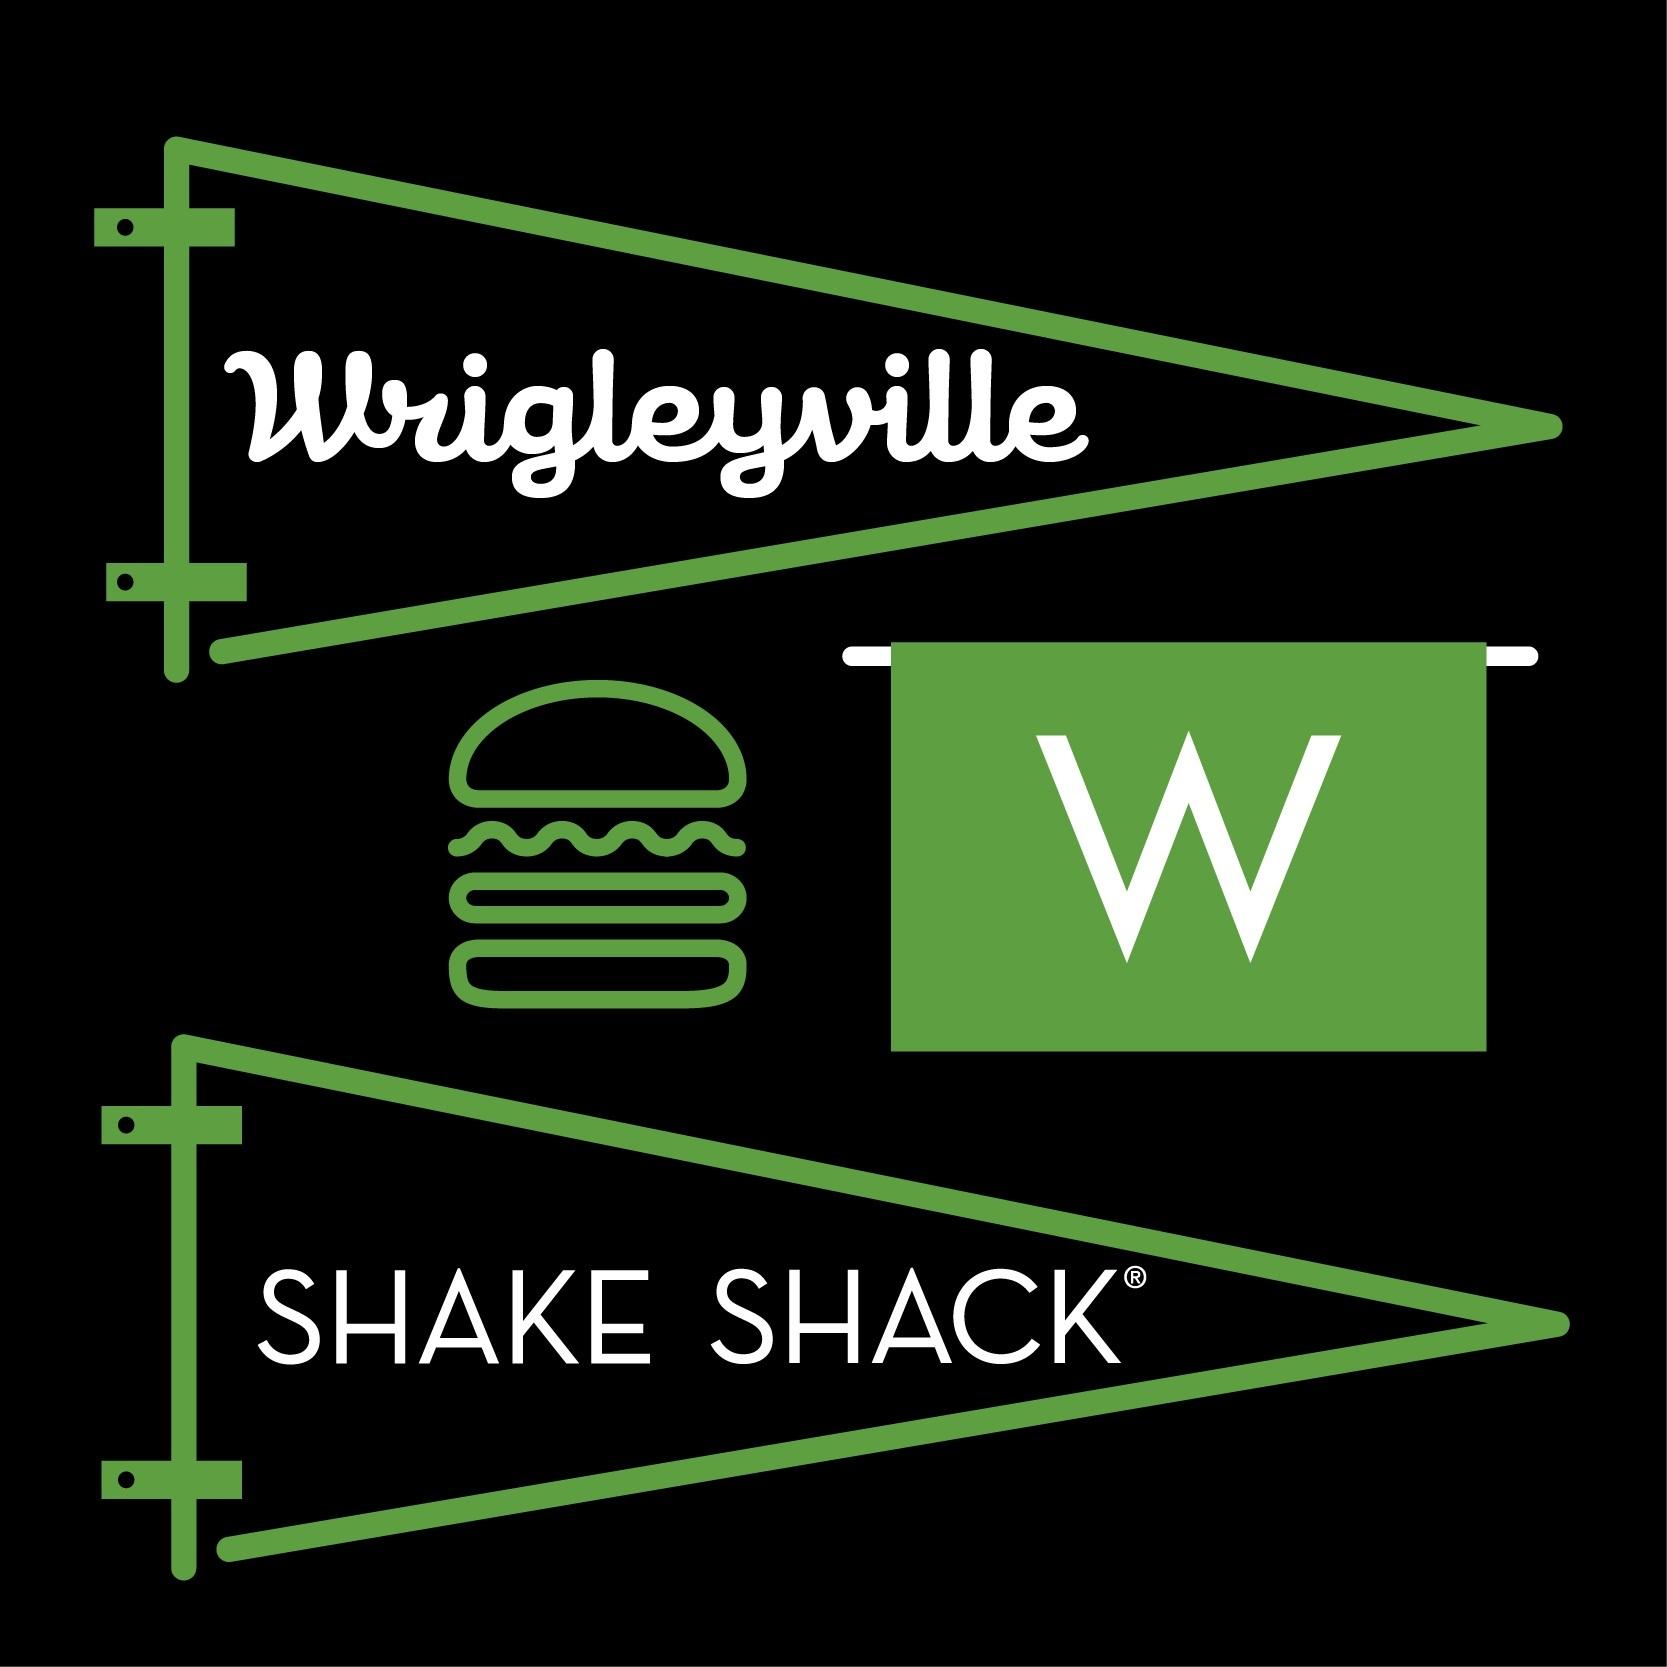 Wrigleyville shake shack logo.jpg